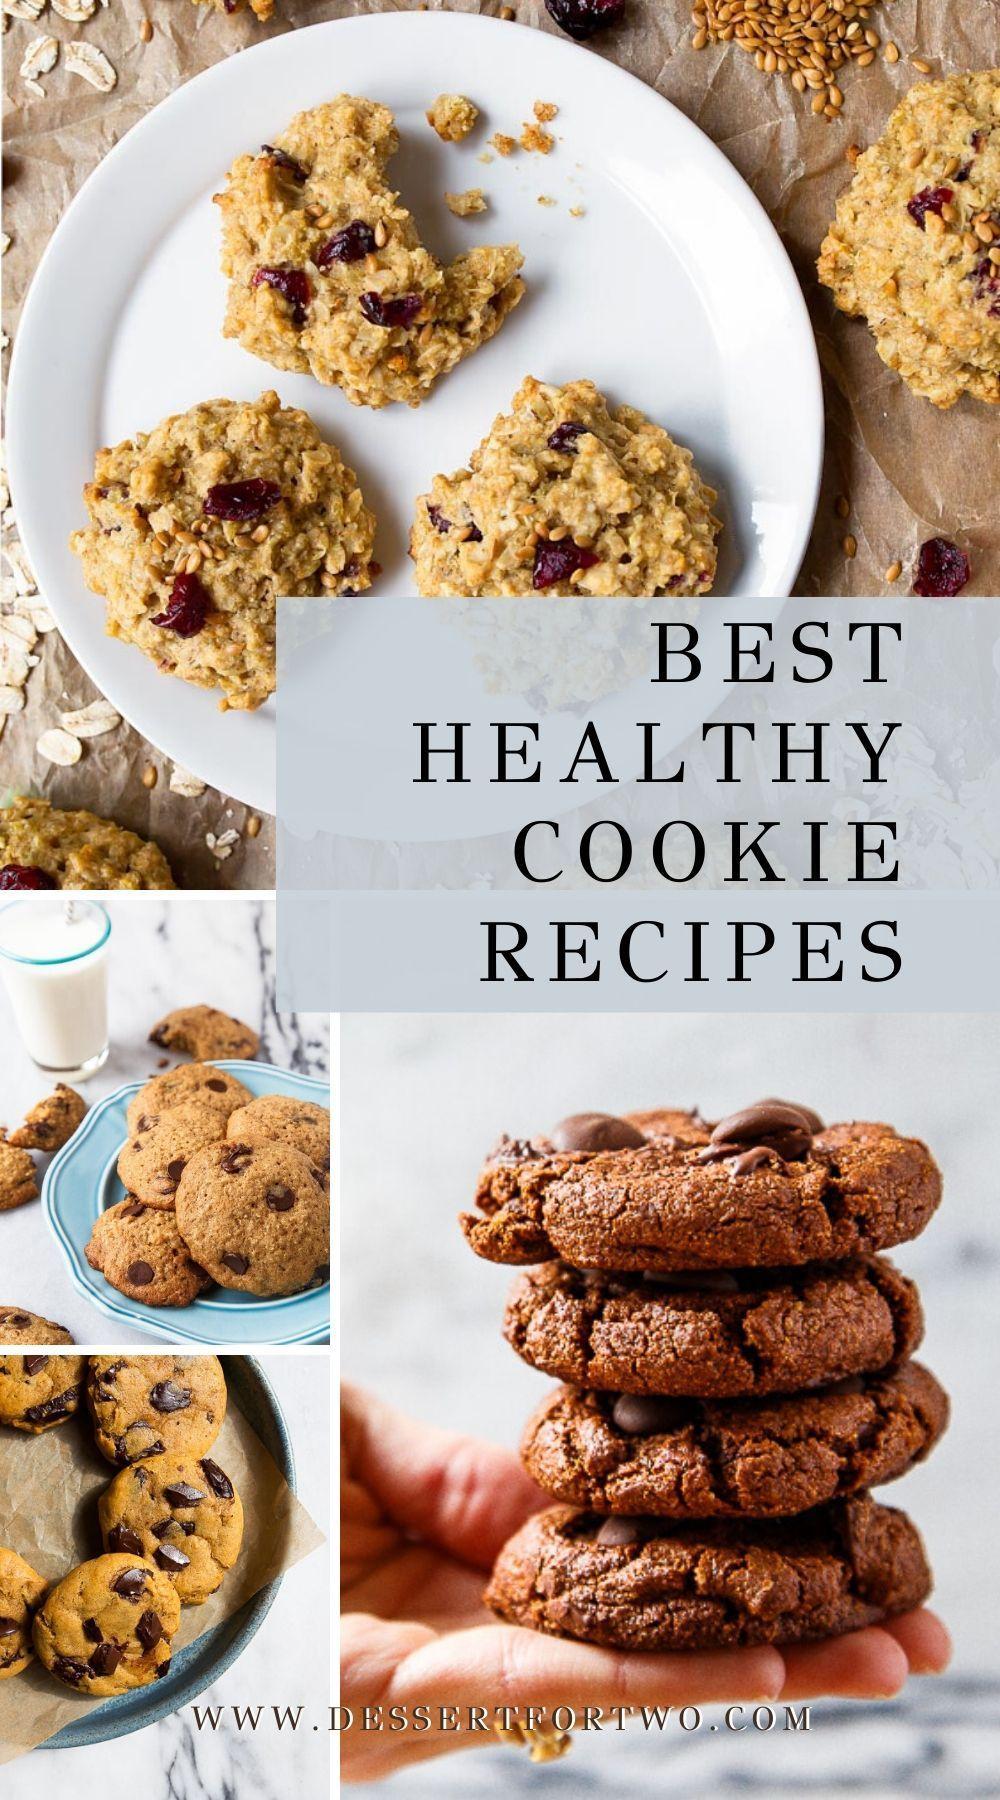 Best Healthy Cookie Recipes Round Up Dessert For Two Healthy Cookie Recipes Healthy Cookies Cookie Recipes